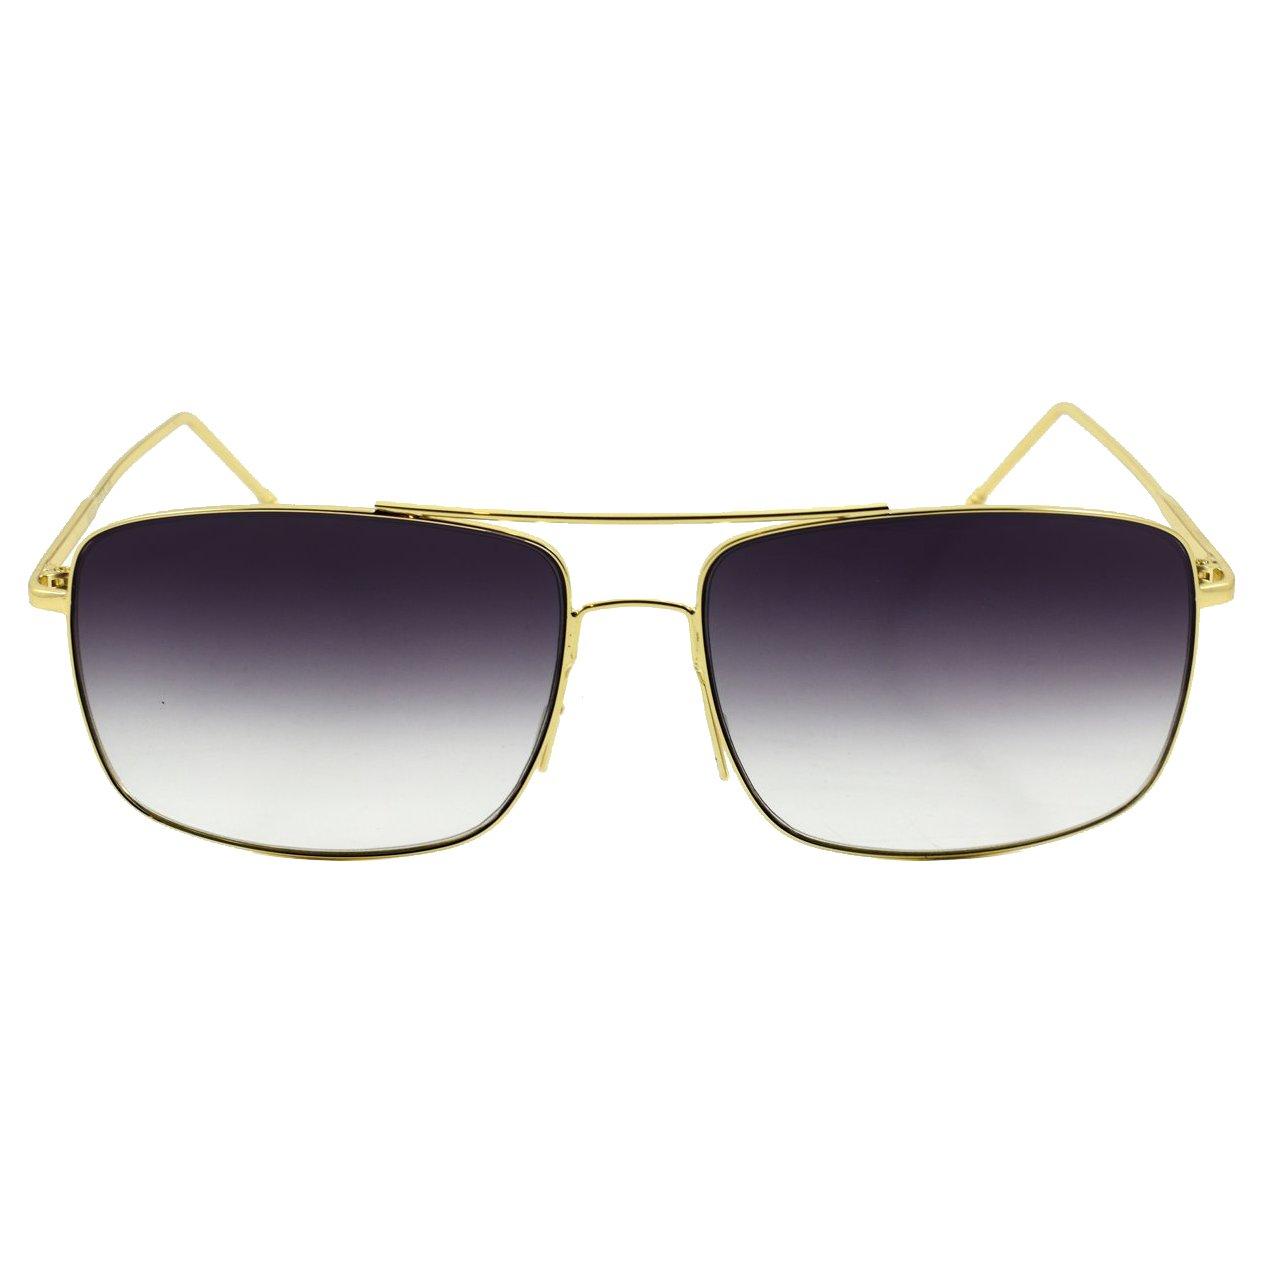 عینک آفتابی ویلی بولو مدل Stainless Steel Daily Collection 2018